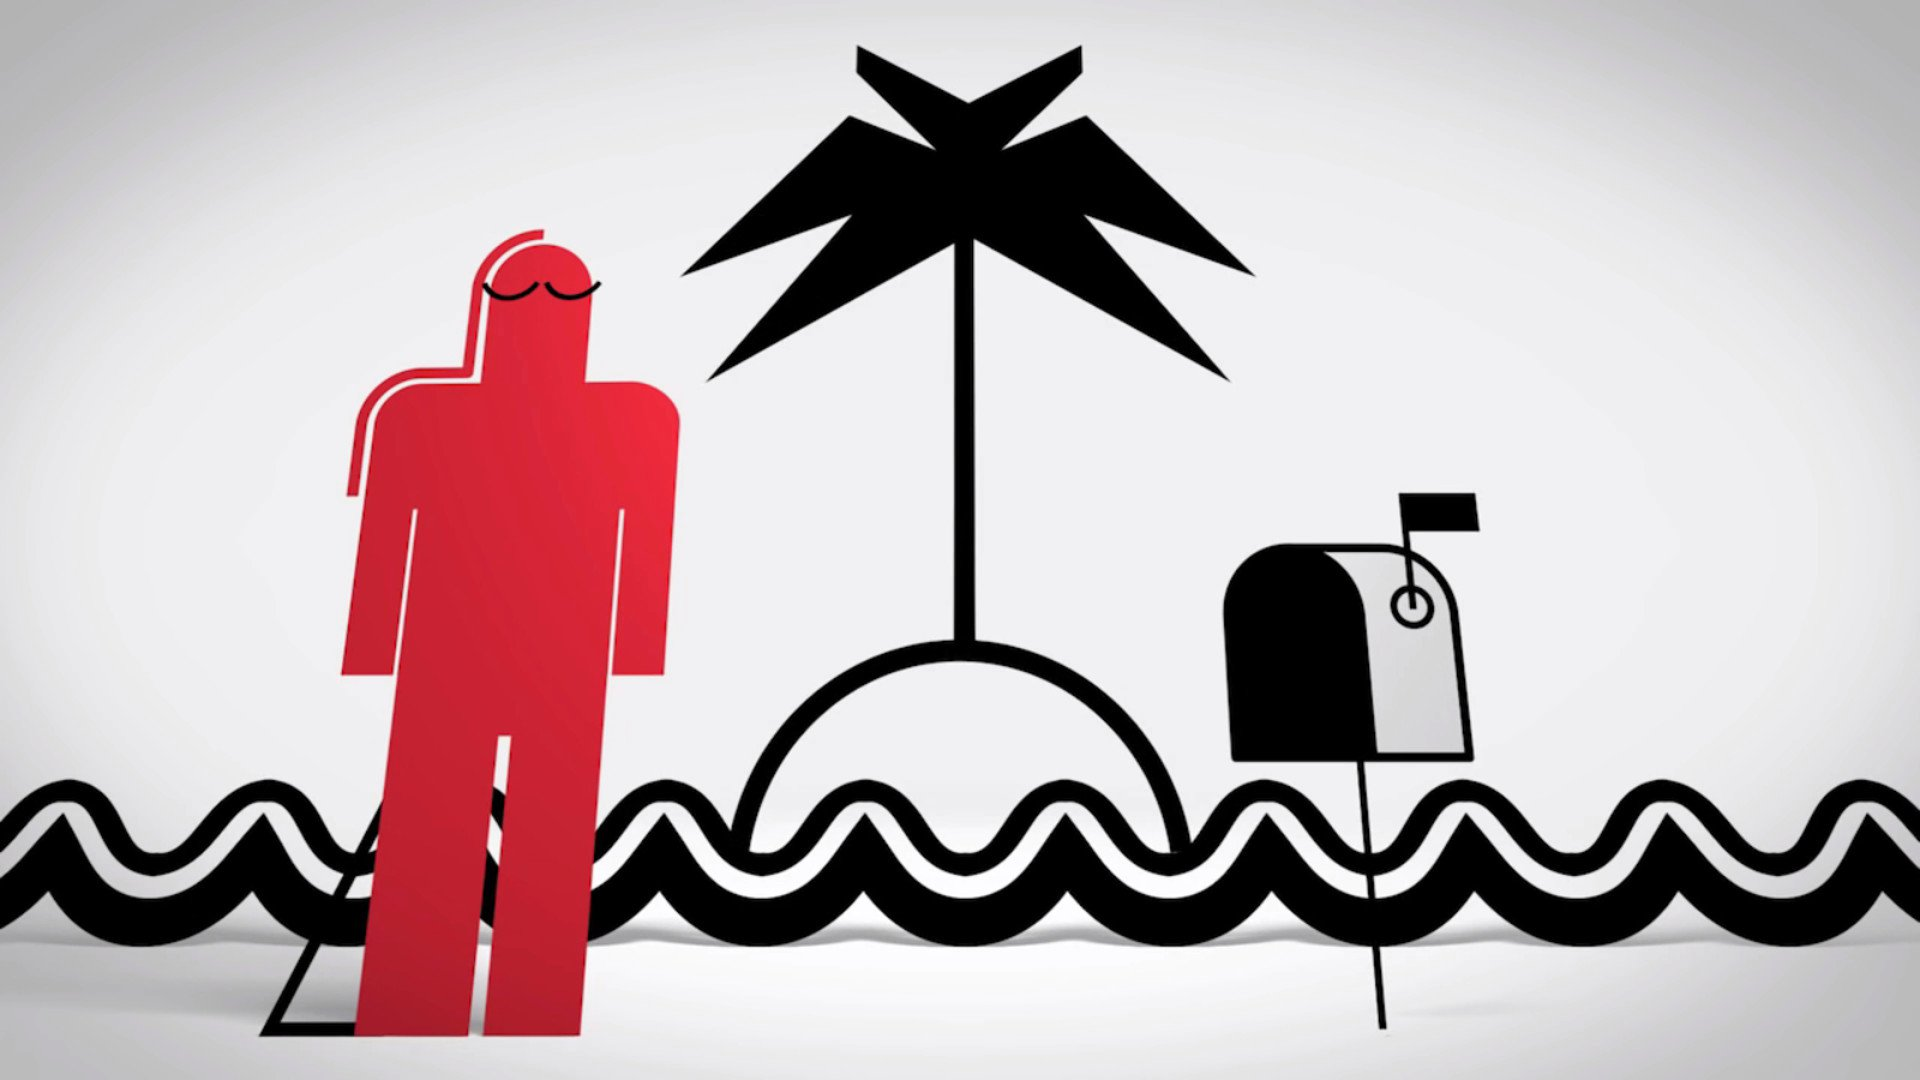 Erlärvideo zum Offshore-Geschäft